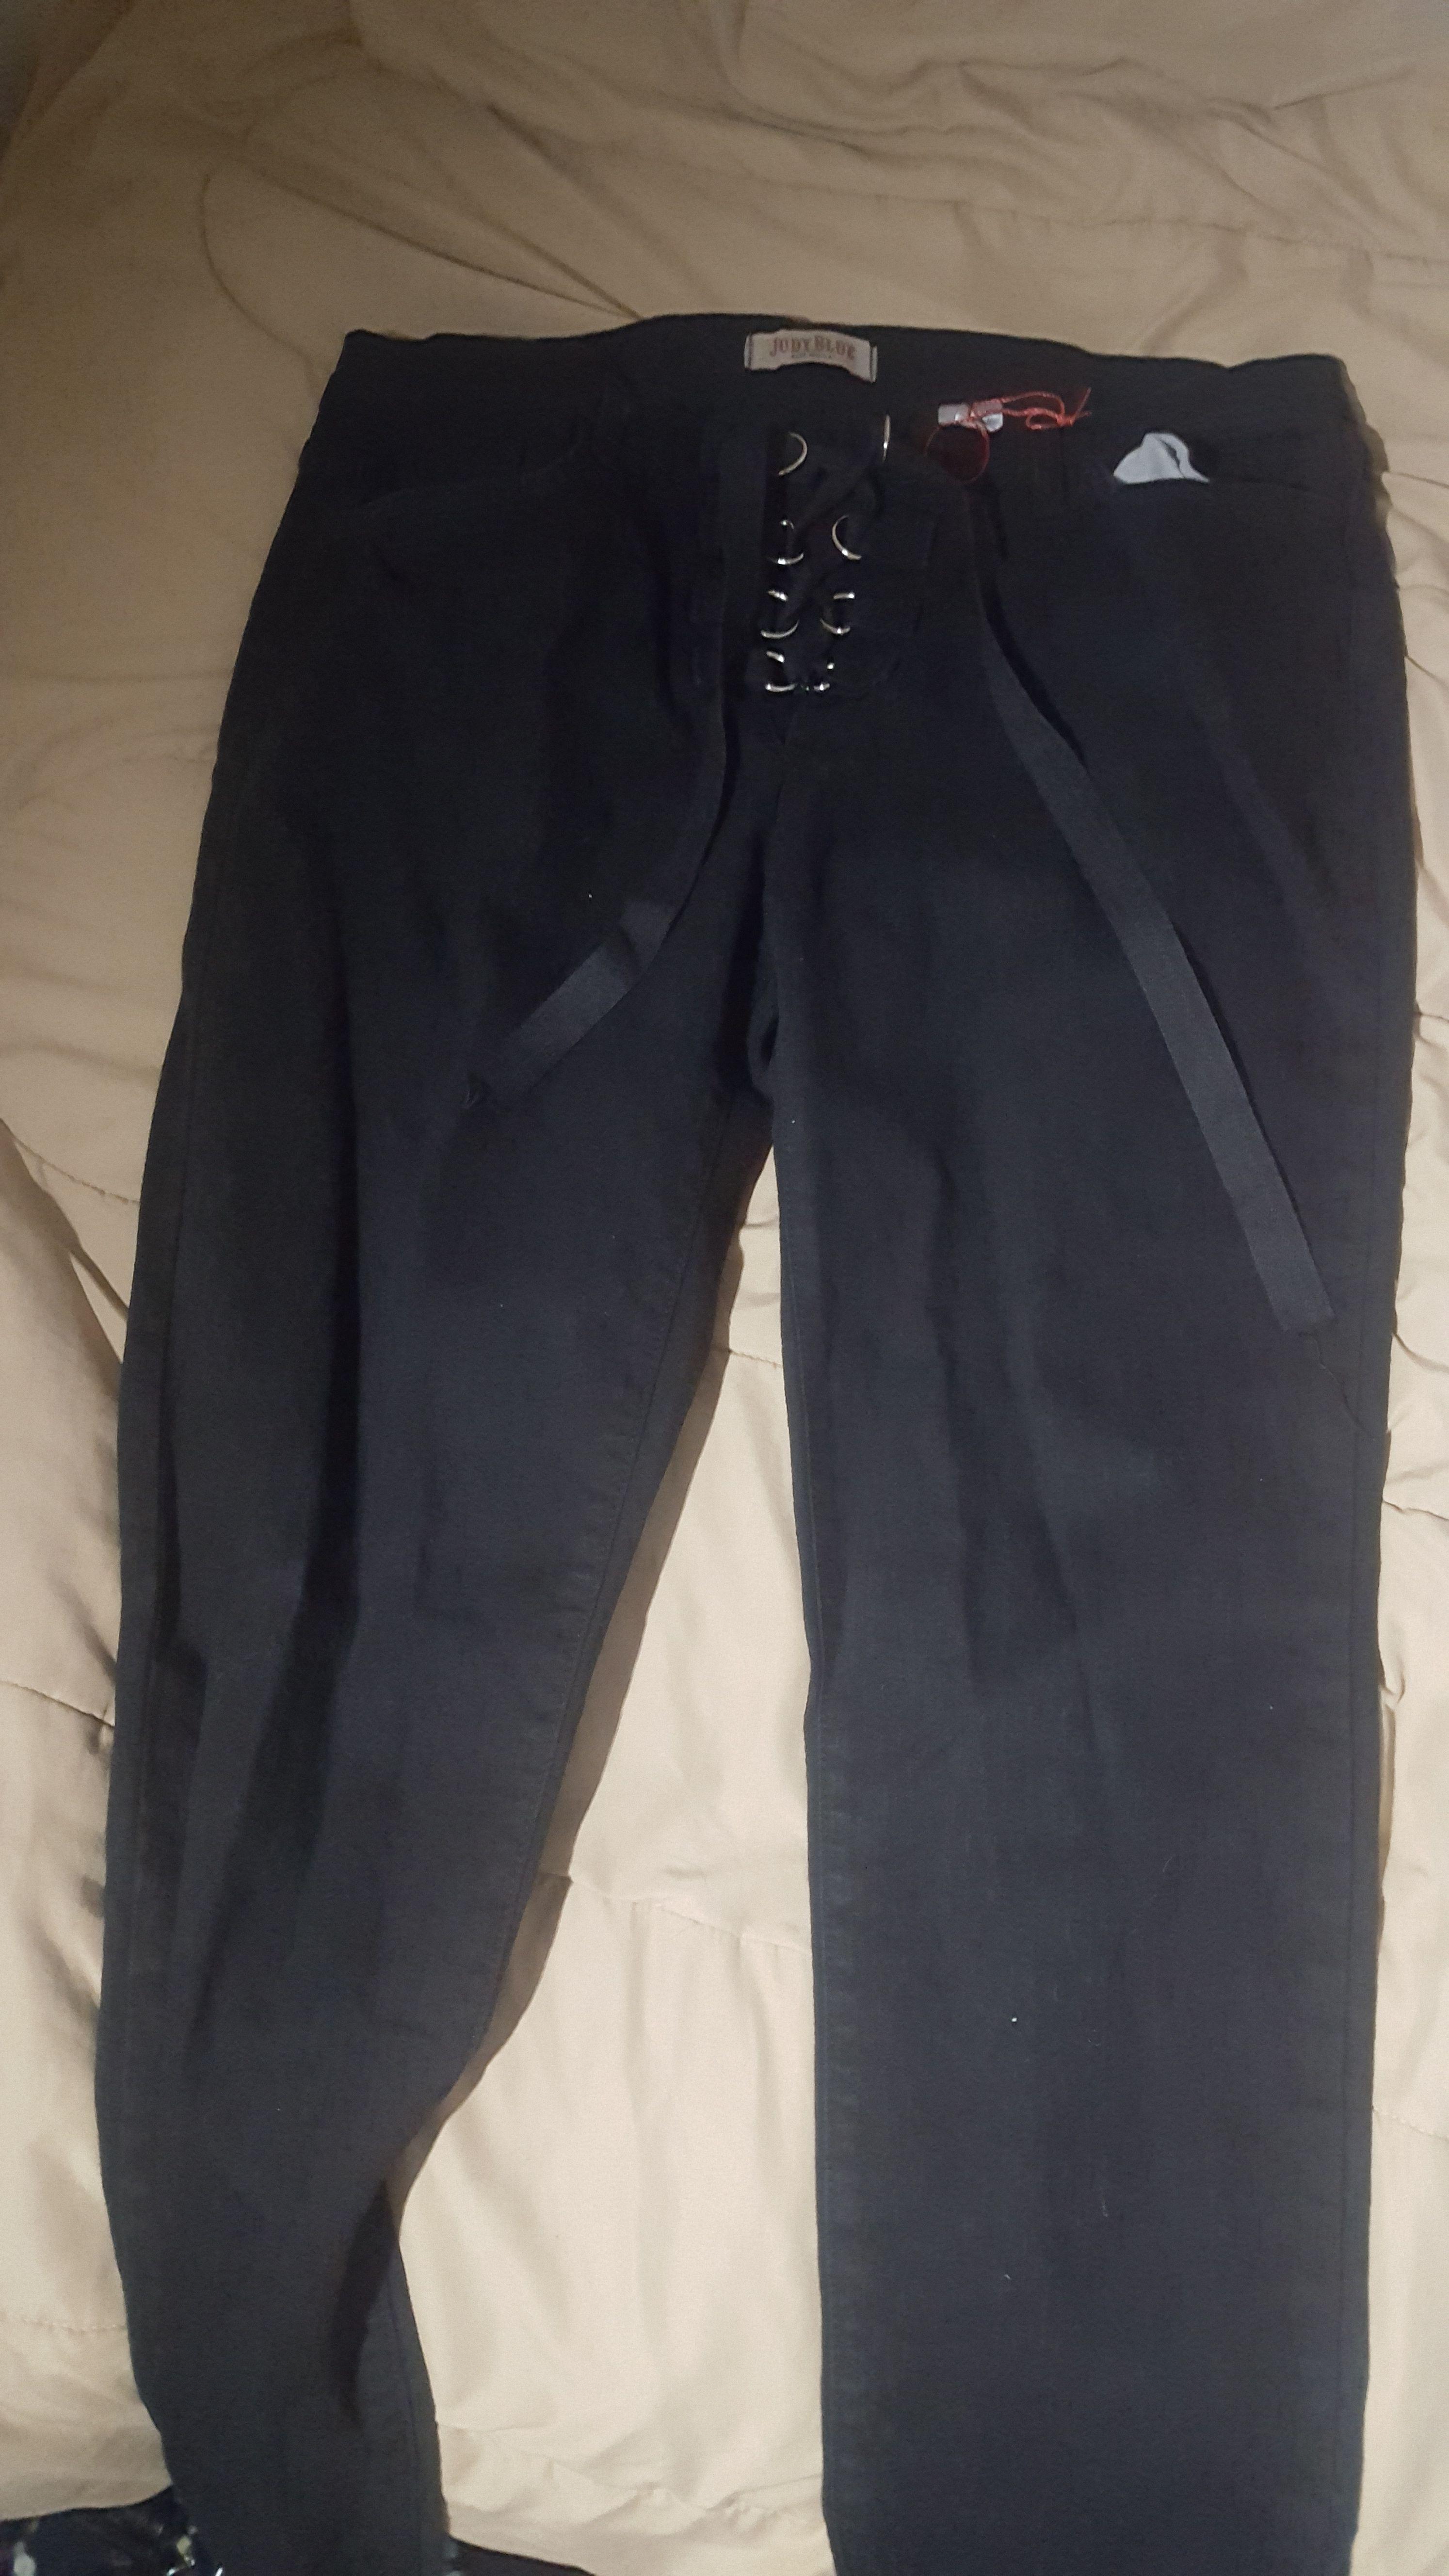 Judy blue lace up pants